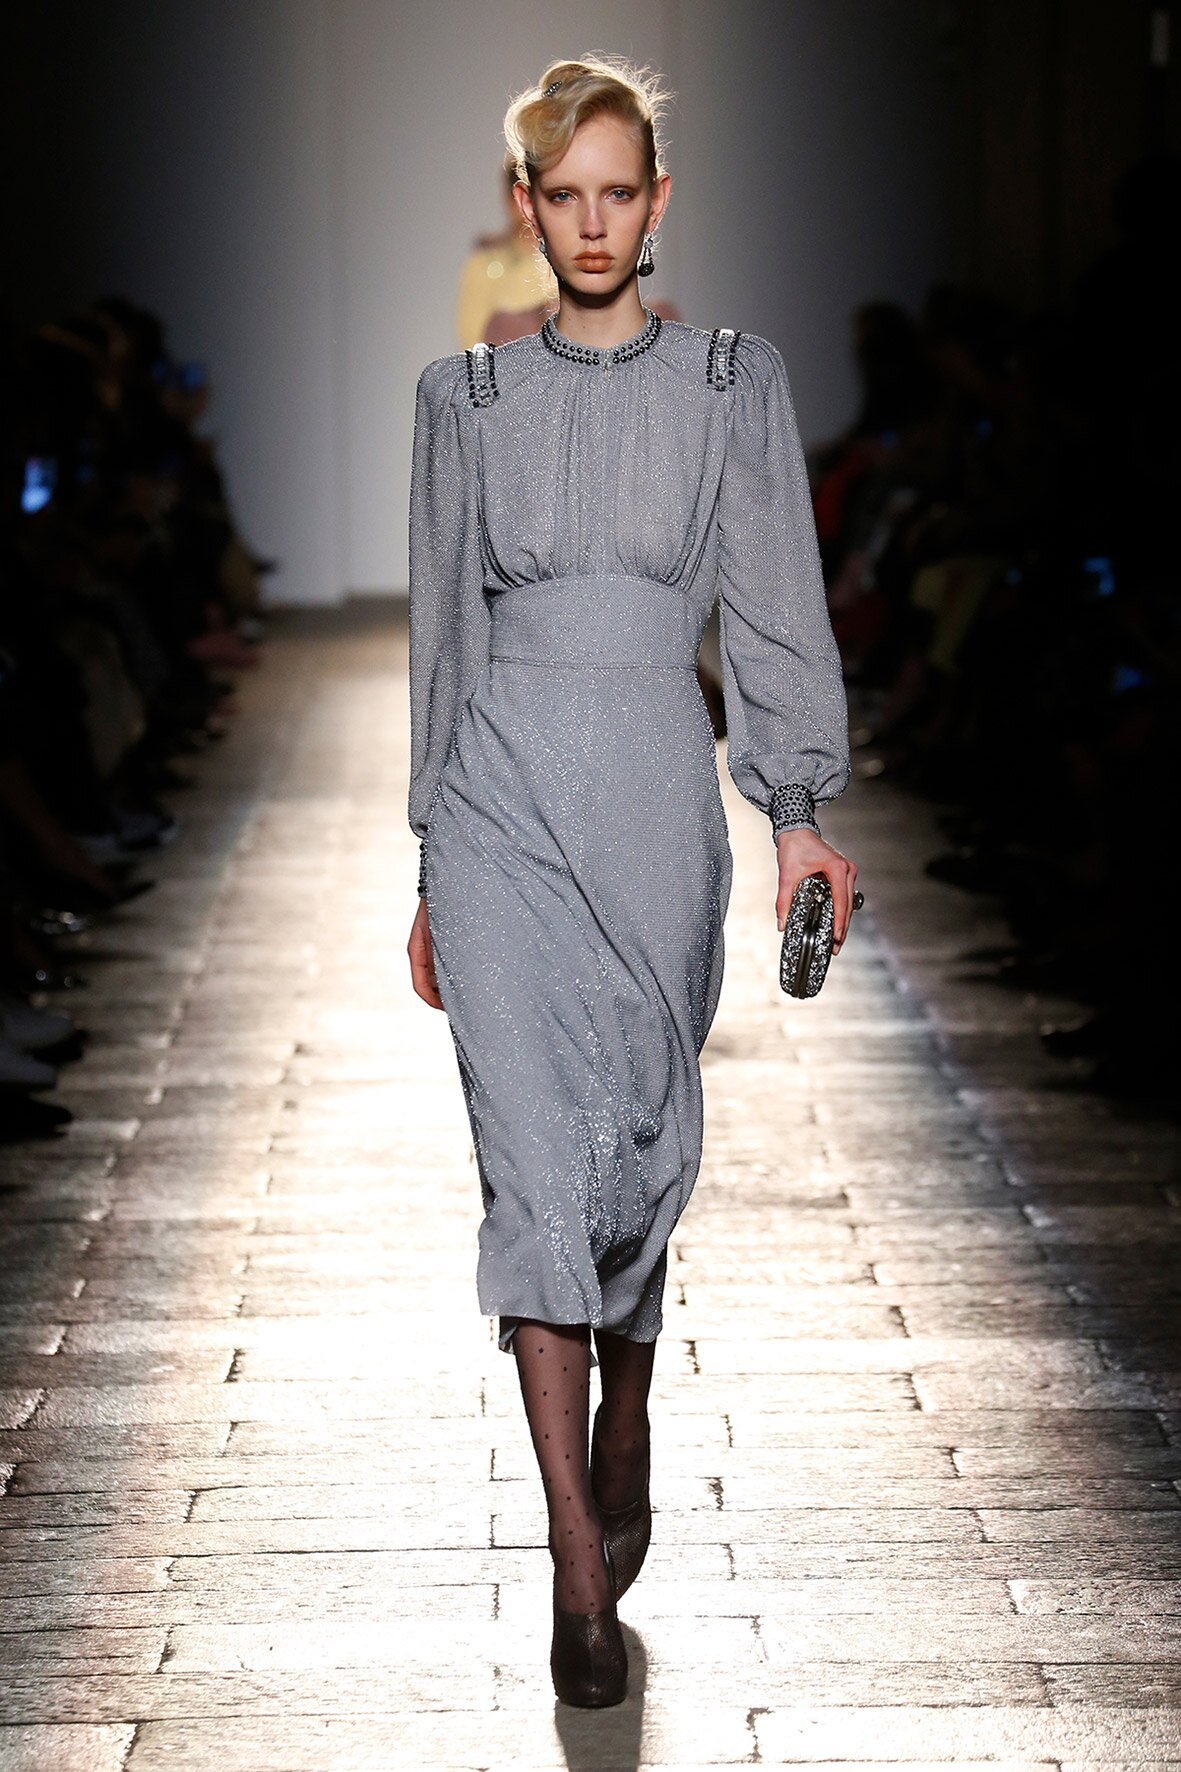 2017-18 Catwalk Bottega Veneta Woman Fashion Show Winter